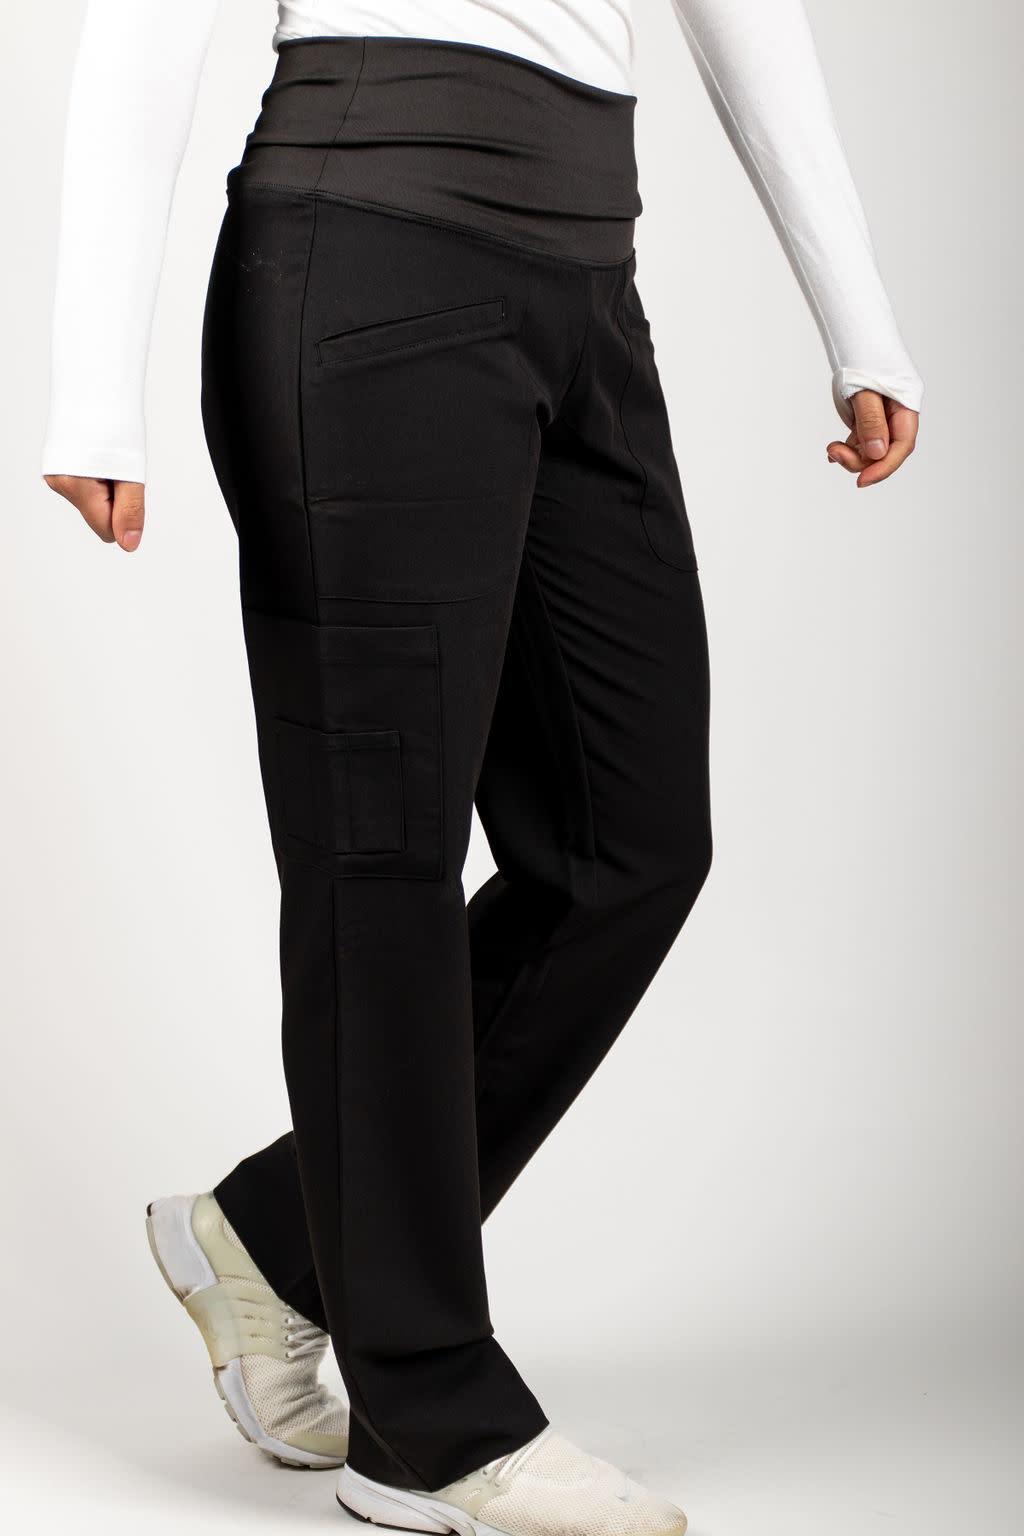 Black Women's Yoga Waistband Pants 985